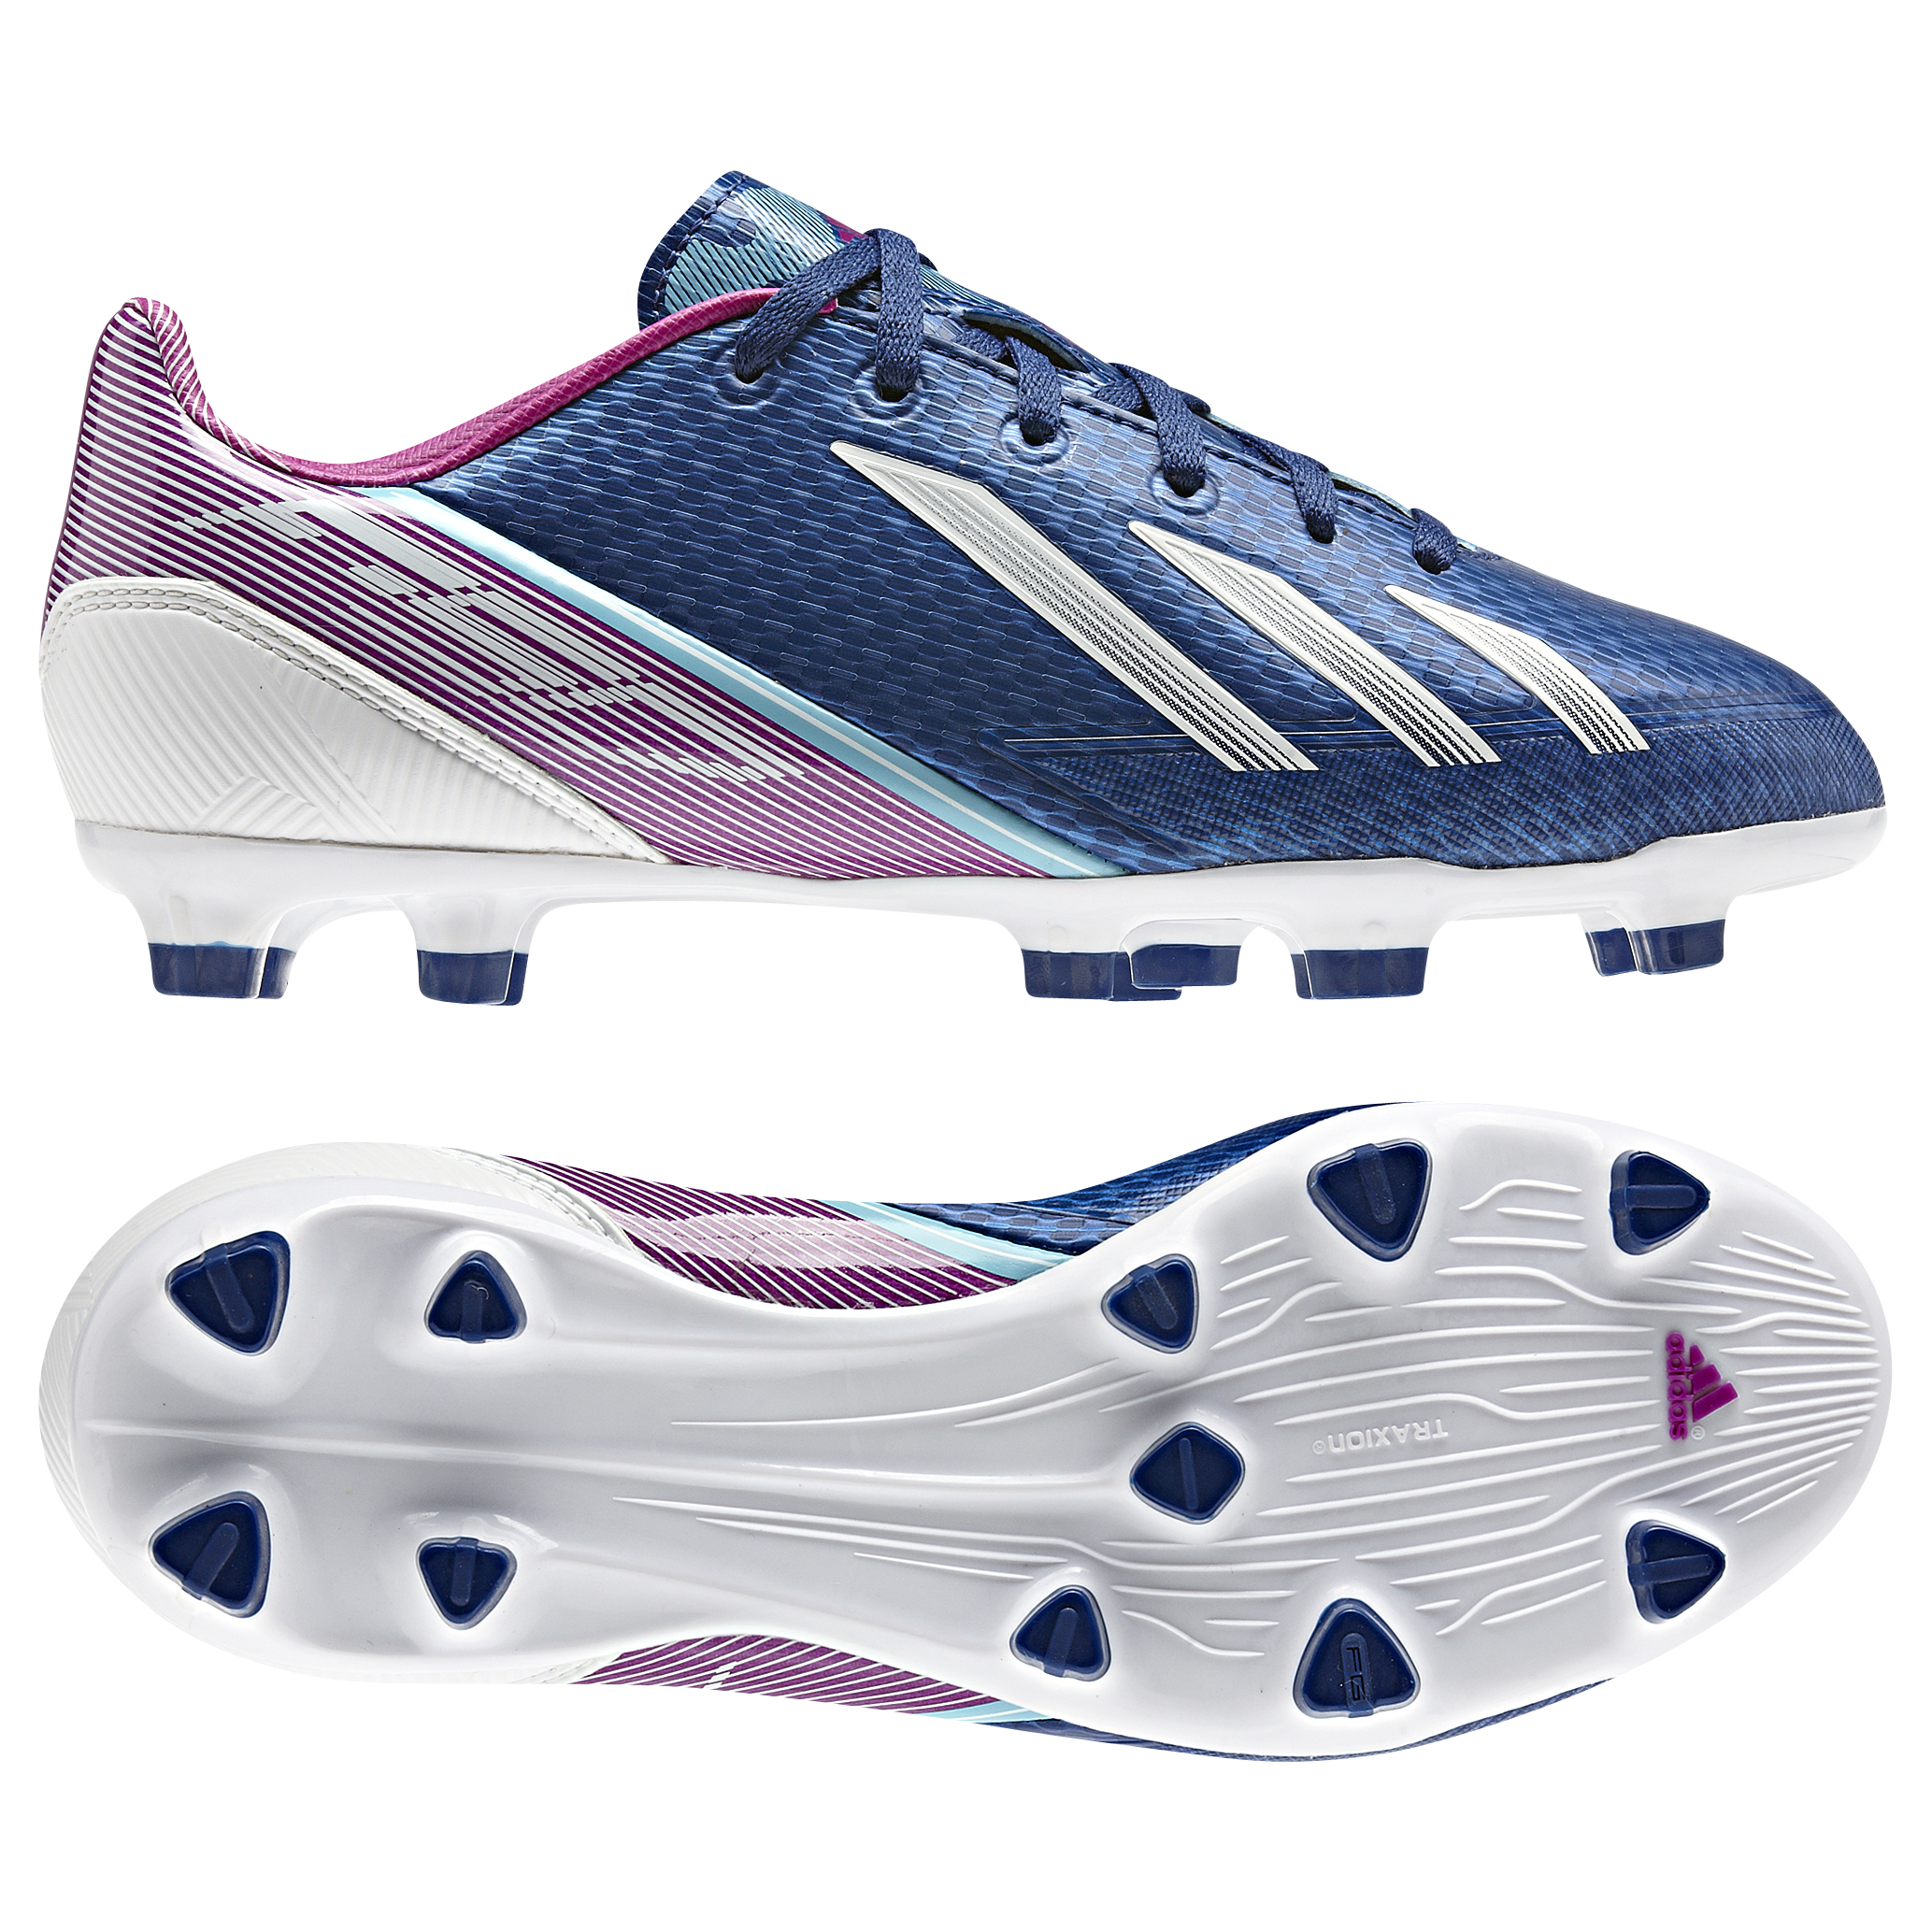 Adidas AdiZero F30 TRX Firm Ground Football Boots  Dark BlueWhiteVivid Pink  Kids